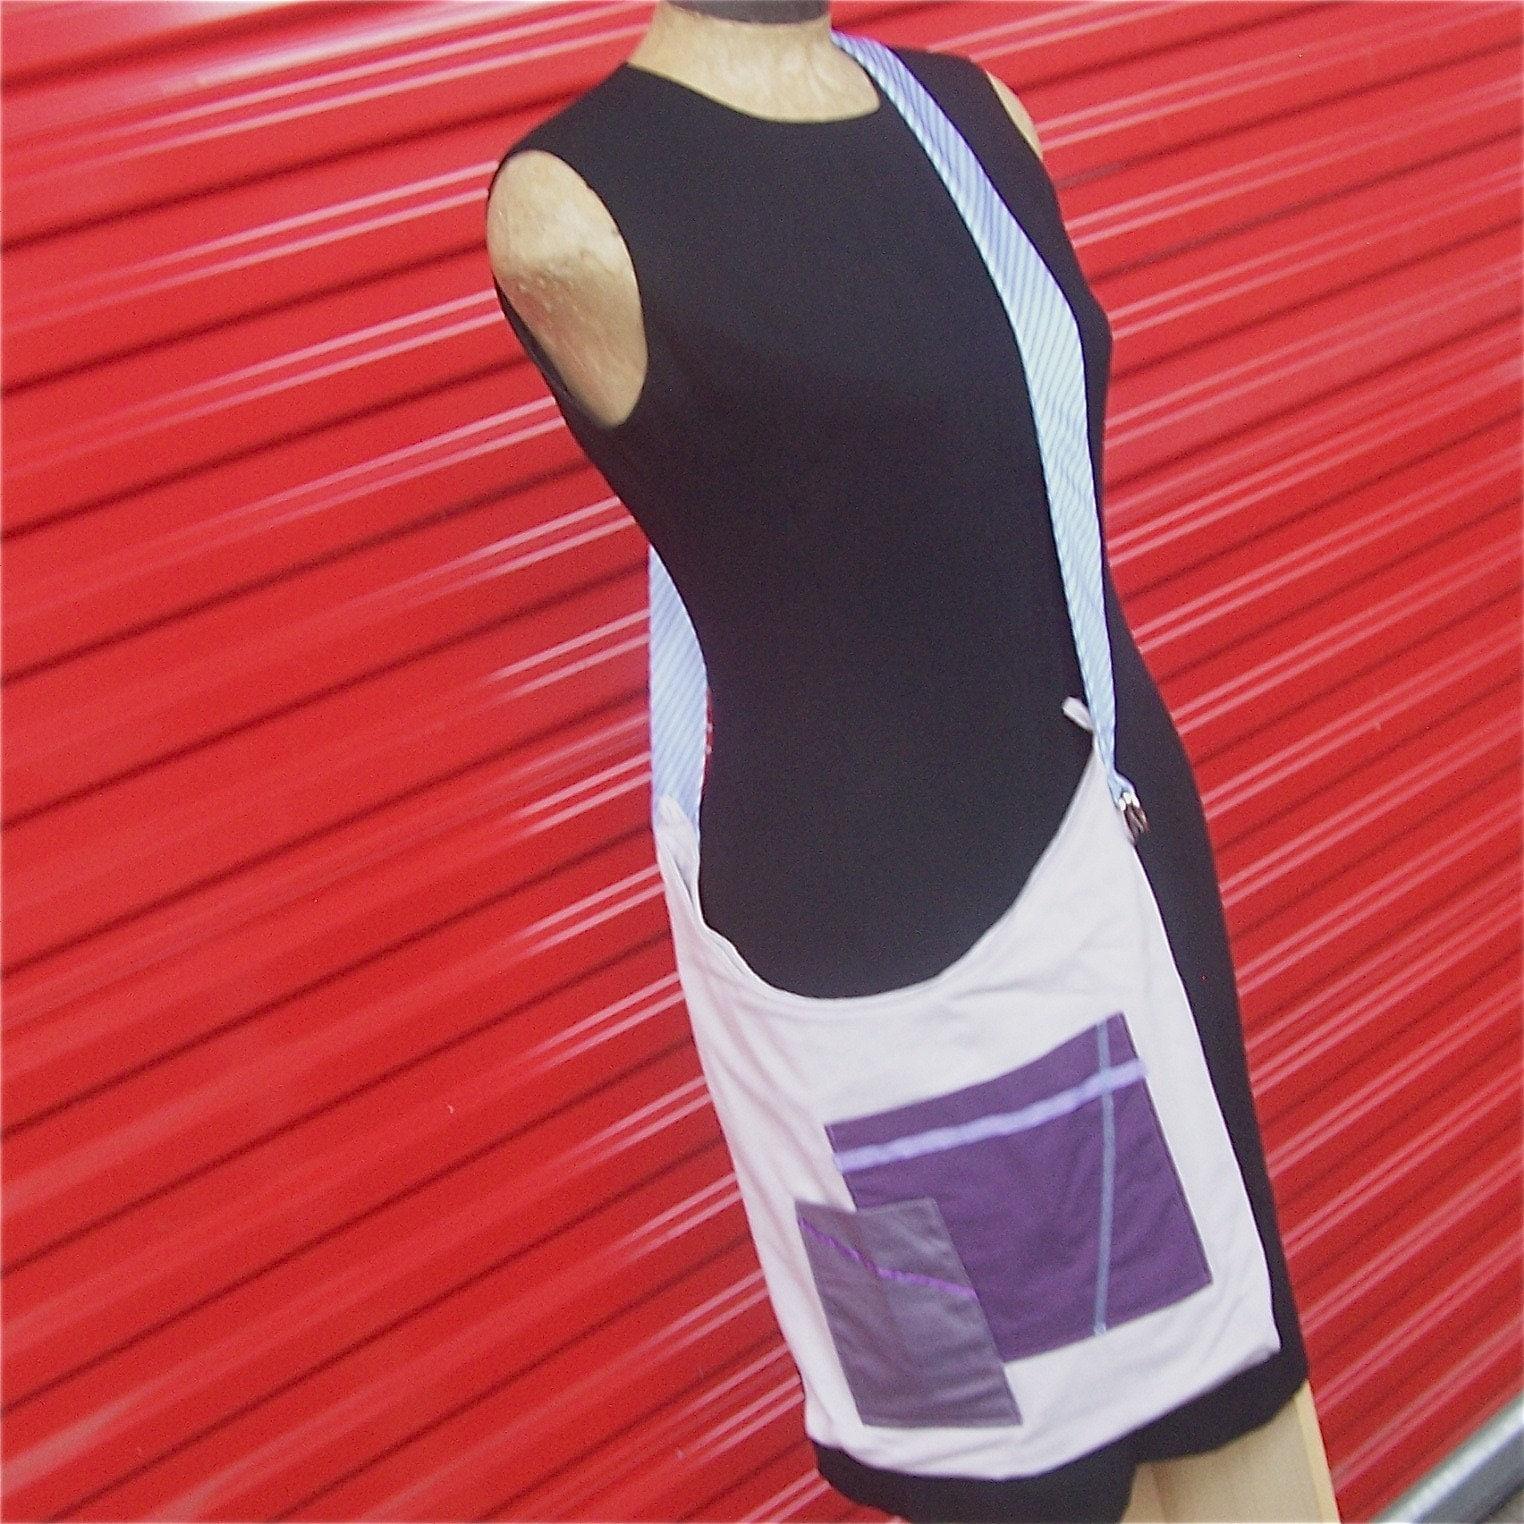 Ecofabulous Purple Bag - Oh Sheet